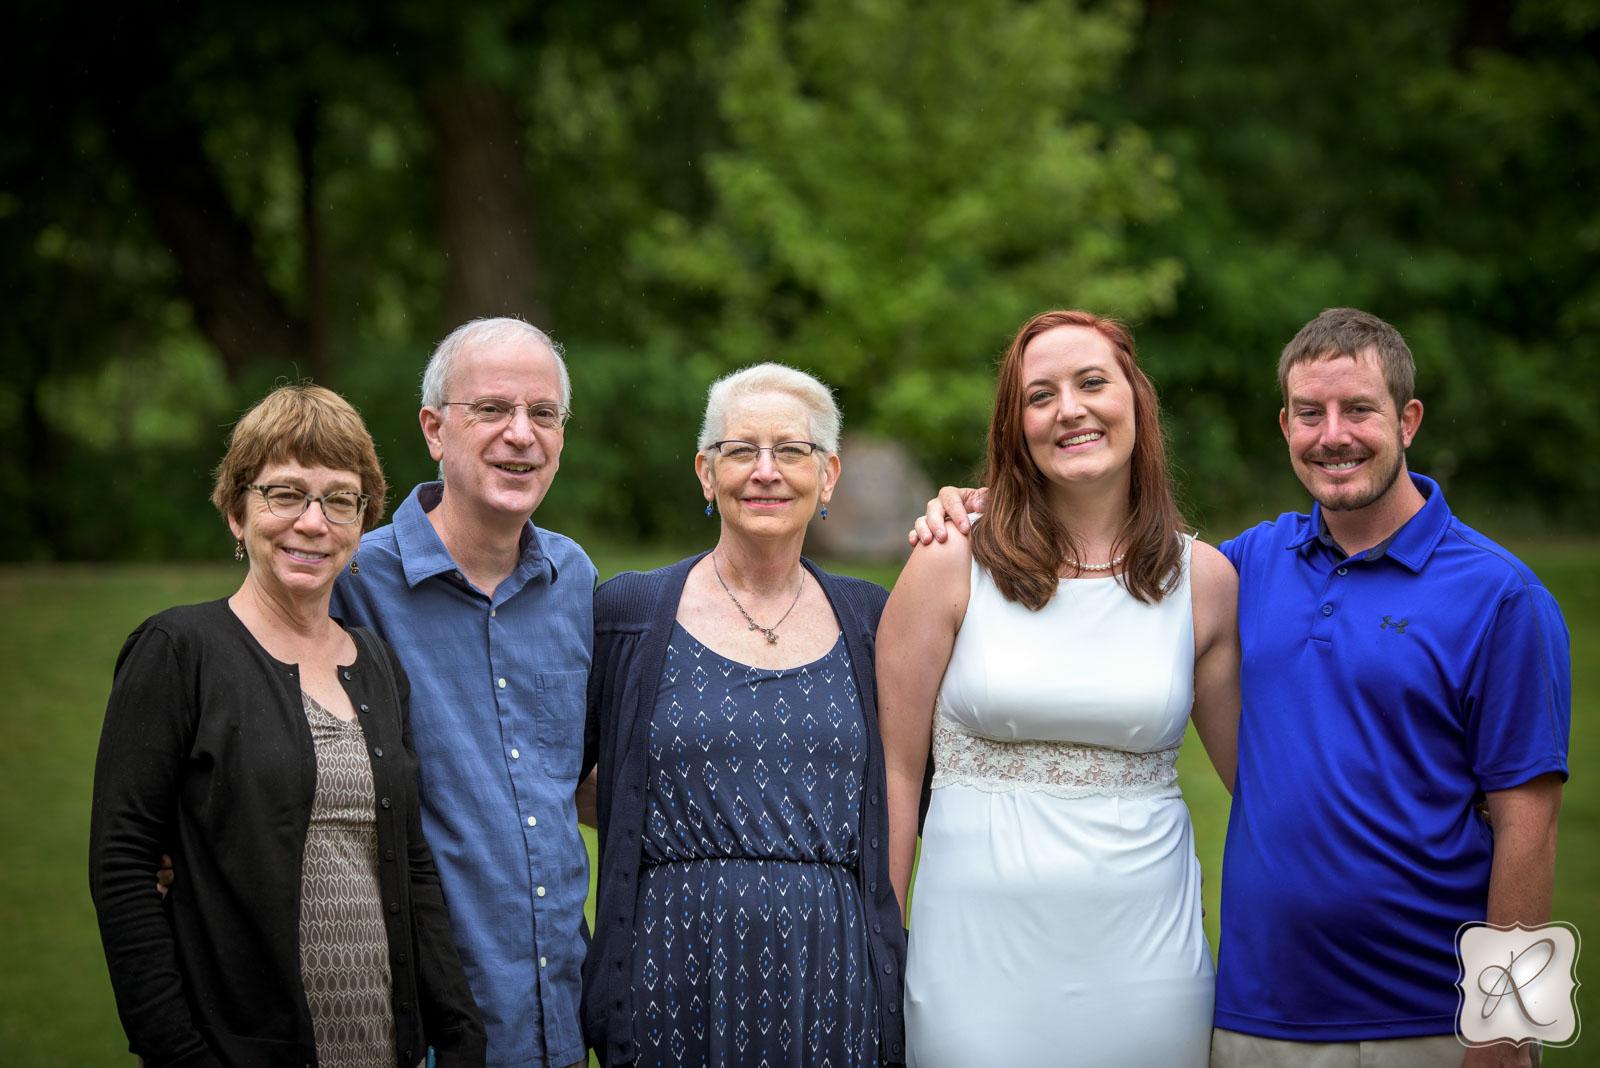 Wyckoff family Durango Colorado